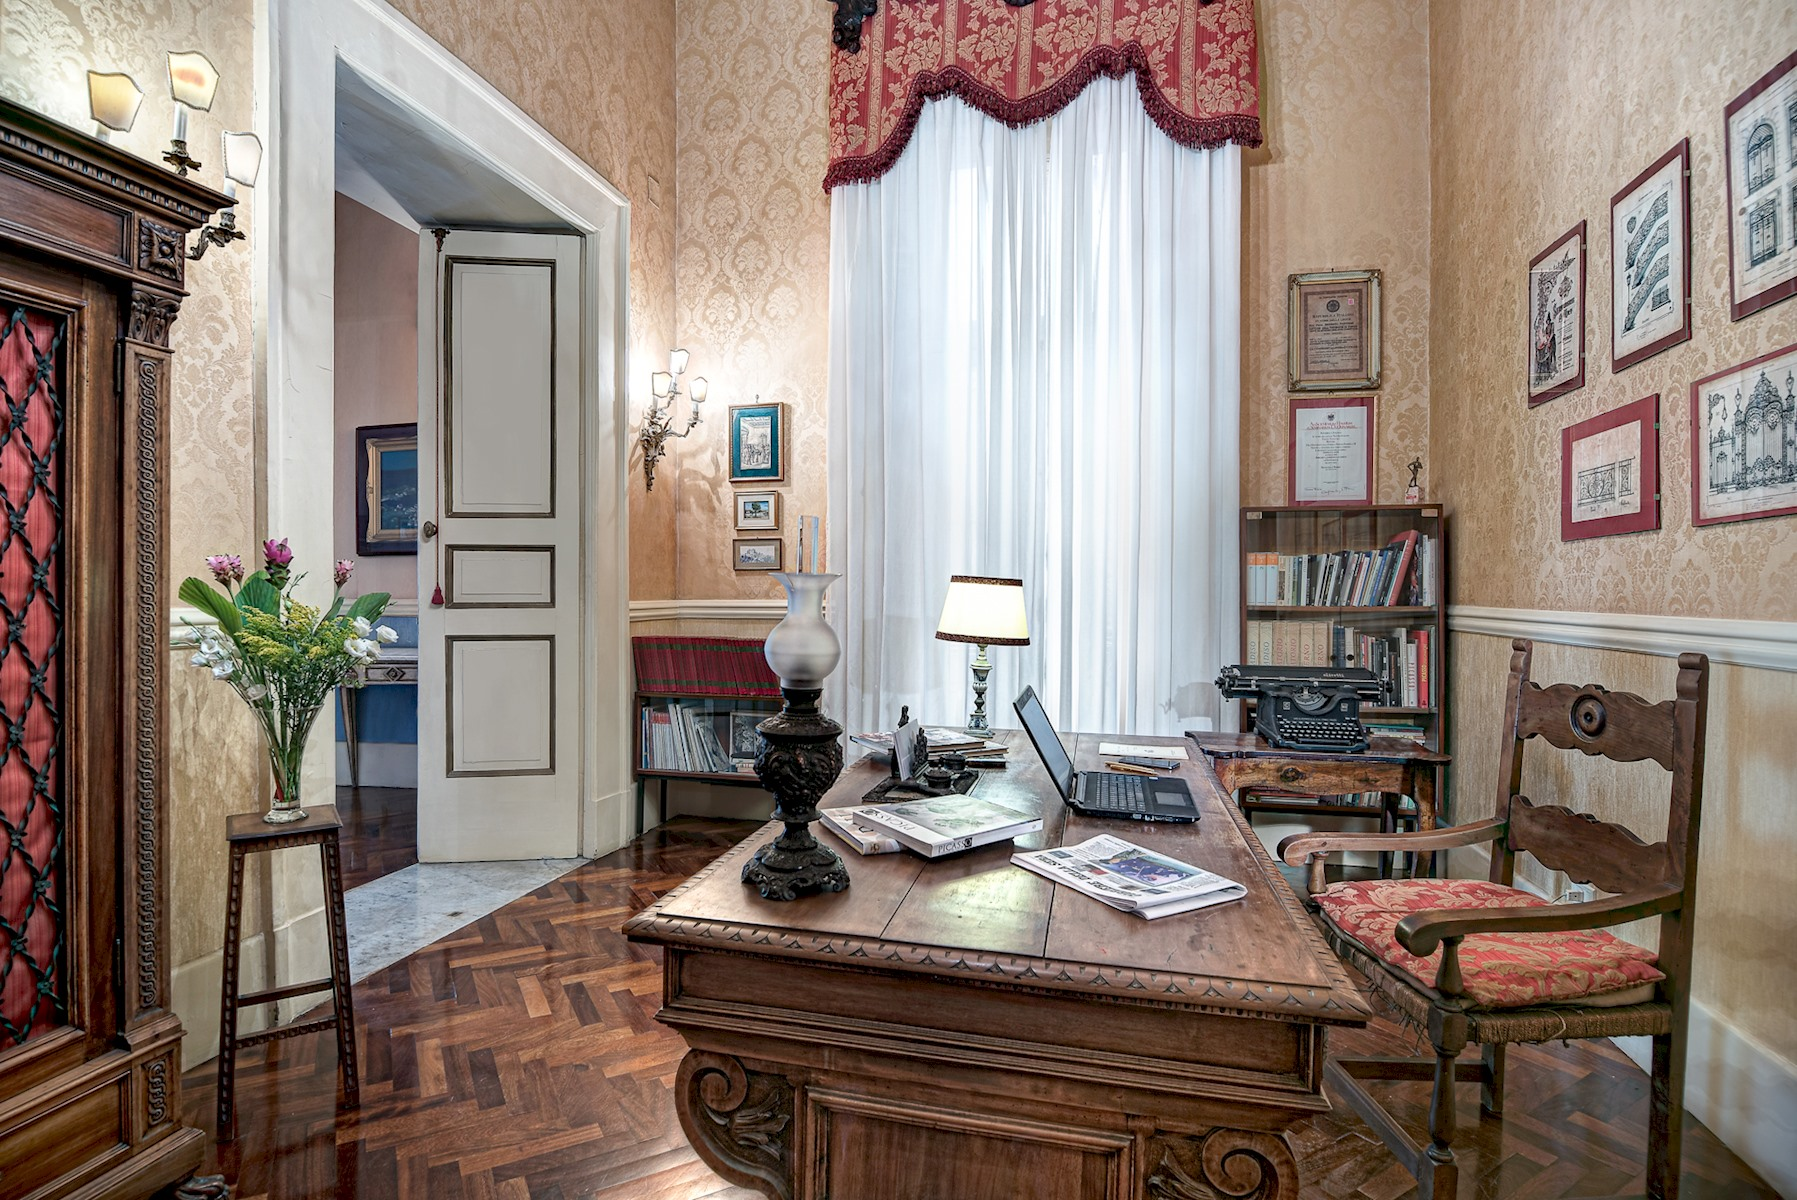 Apartment Arthouse - Lady Mary s Tribunali Luxury Suite - Naples Historical Centre photo 20429035